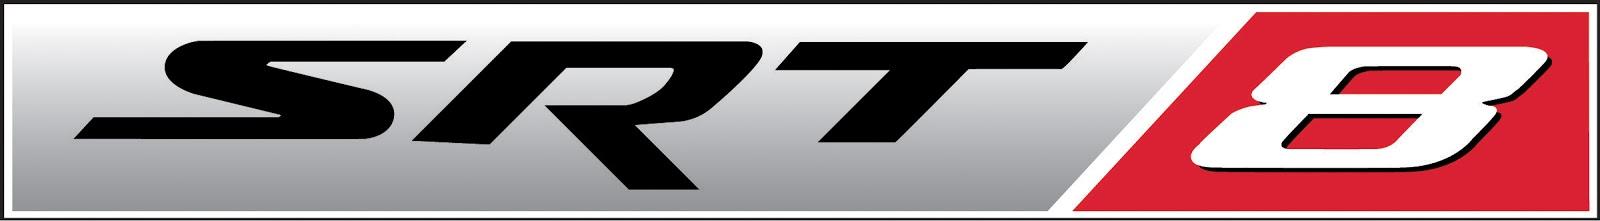 SRT8 Logo